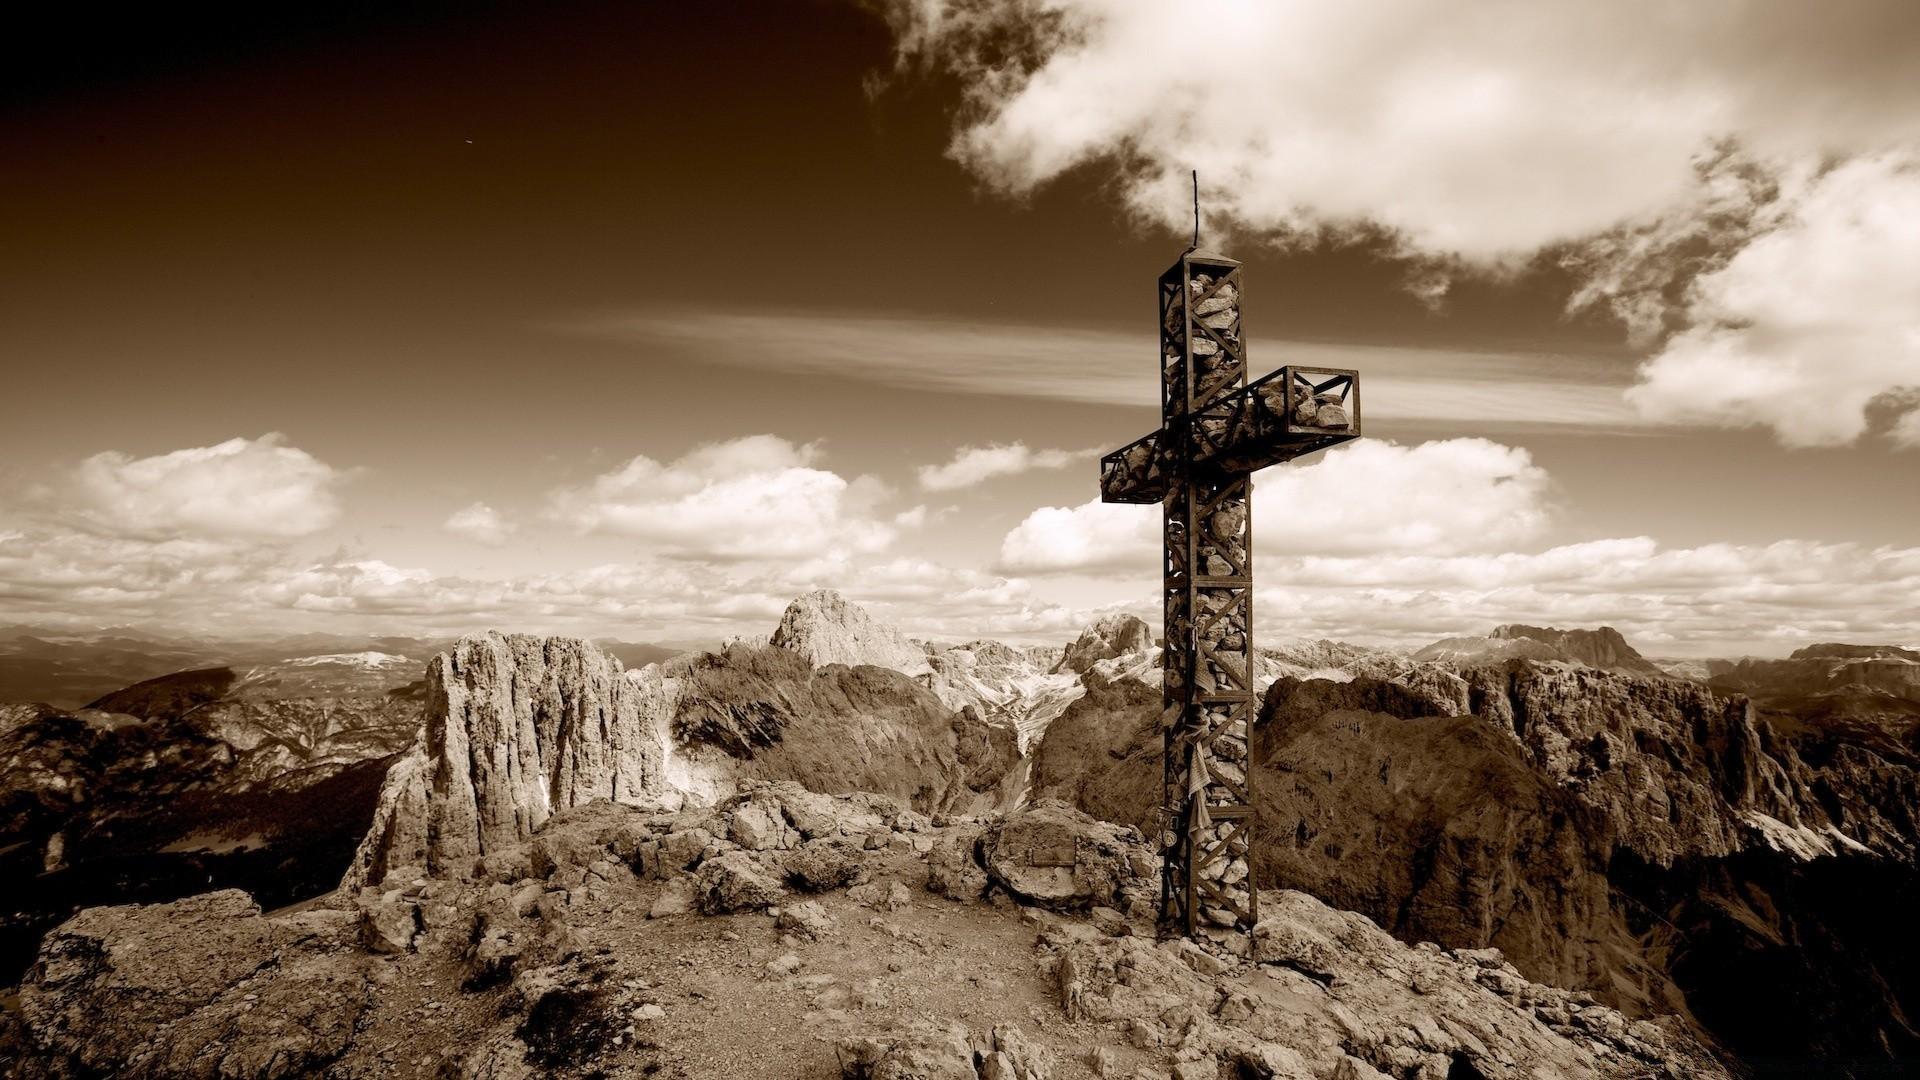 Христианский сайт картинки, спортсмен картинки открытки